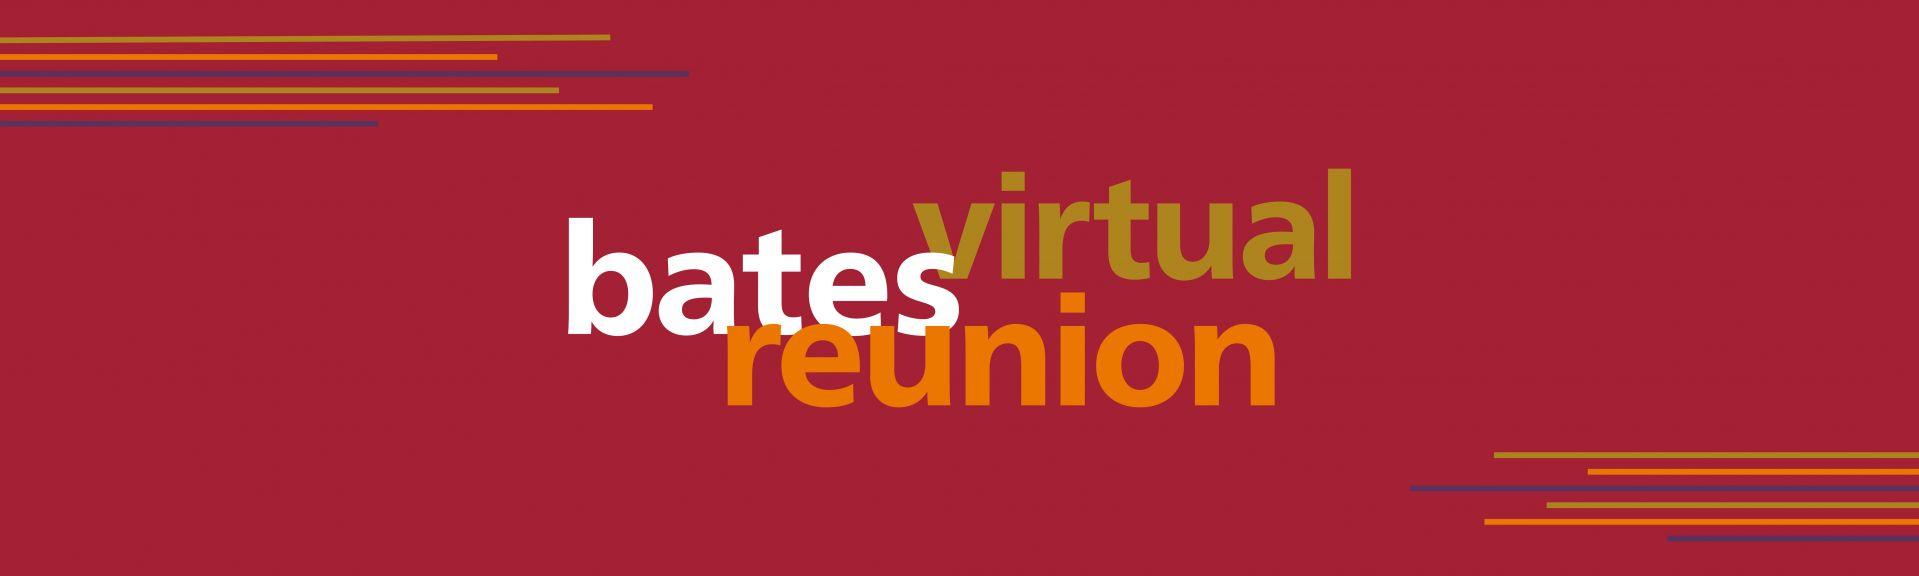 Bates Virtual Reunion